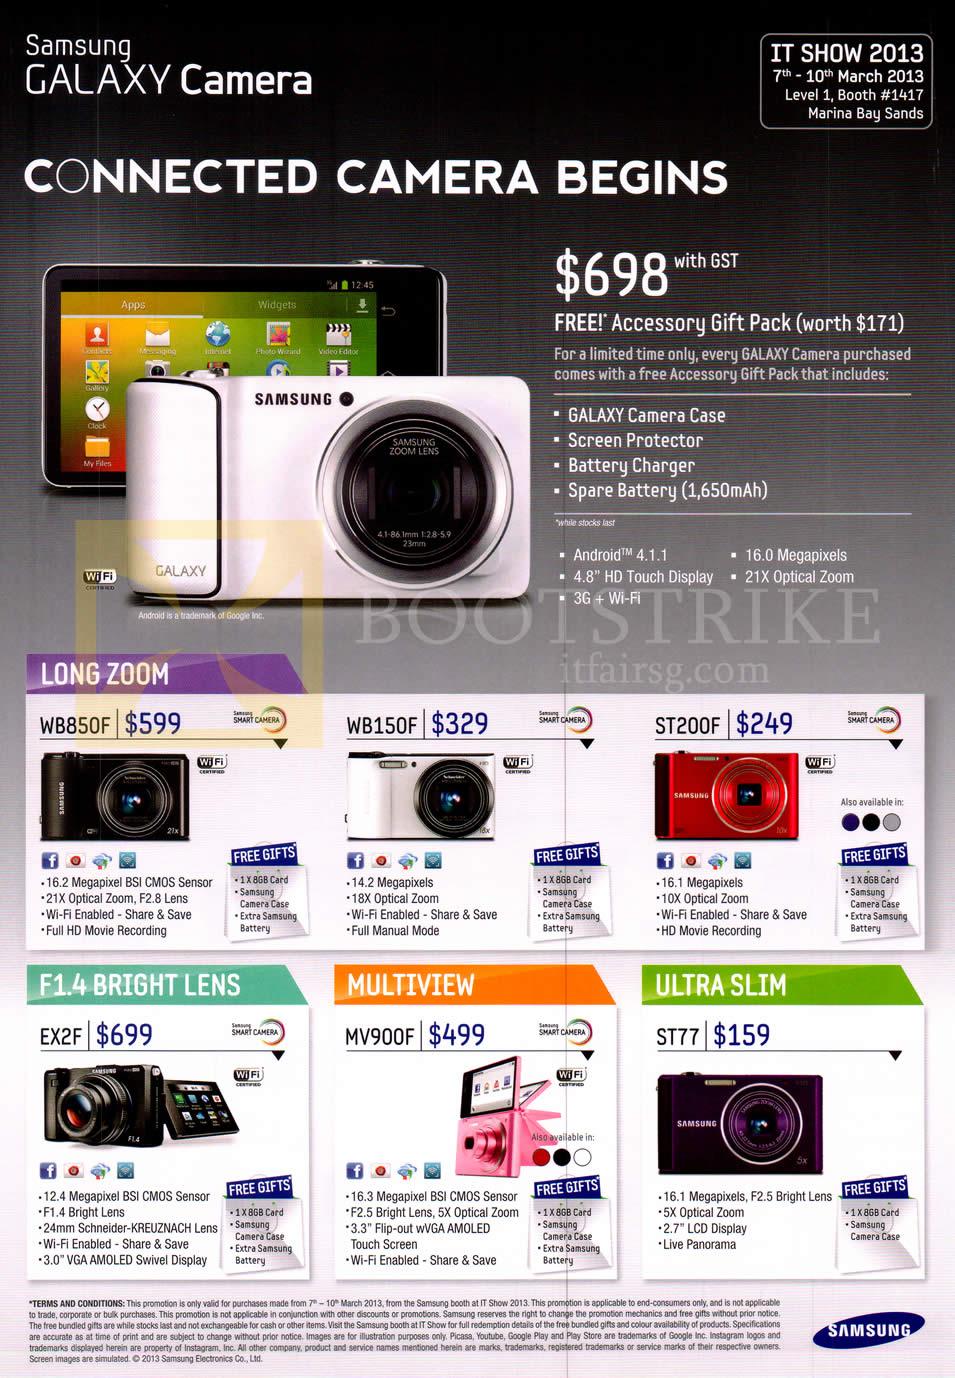 IT SHOW 2013 price list image brochure of Samsung Digital Cameras Galaxy Camera, WB850F, WB150F, ST200F, EX2F, MV900F, ST77